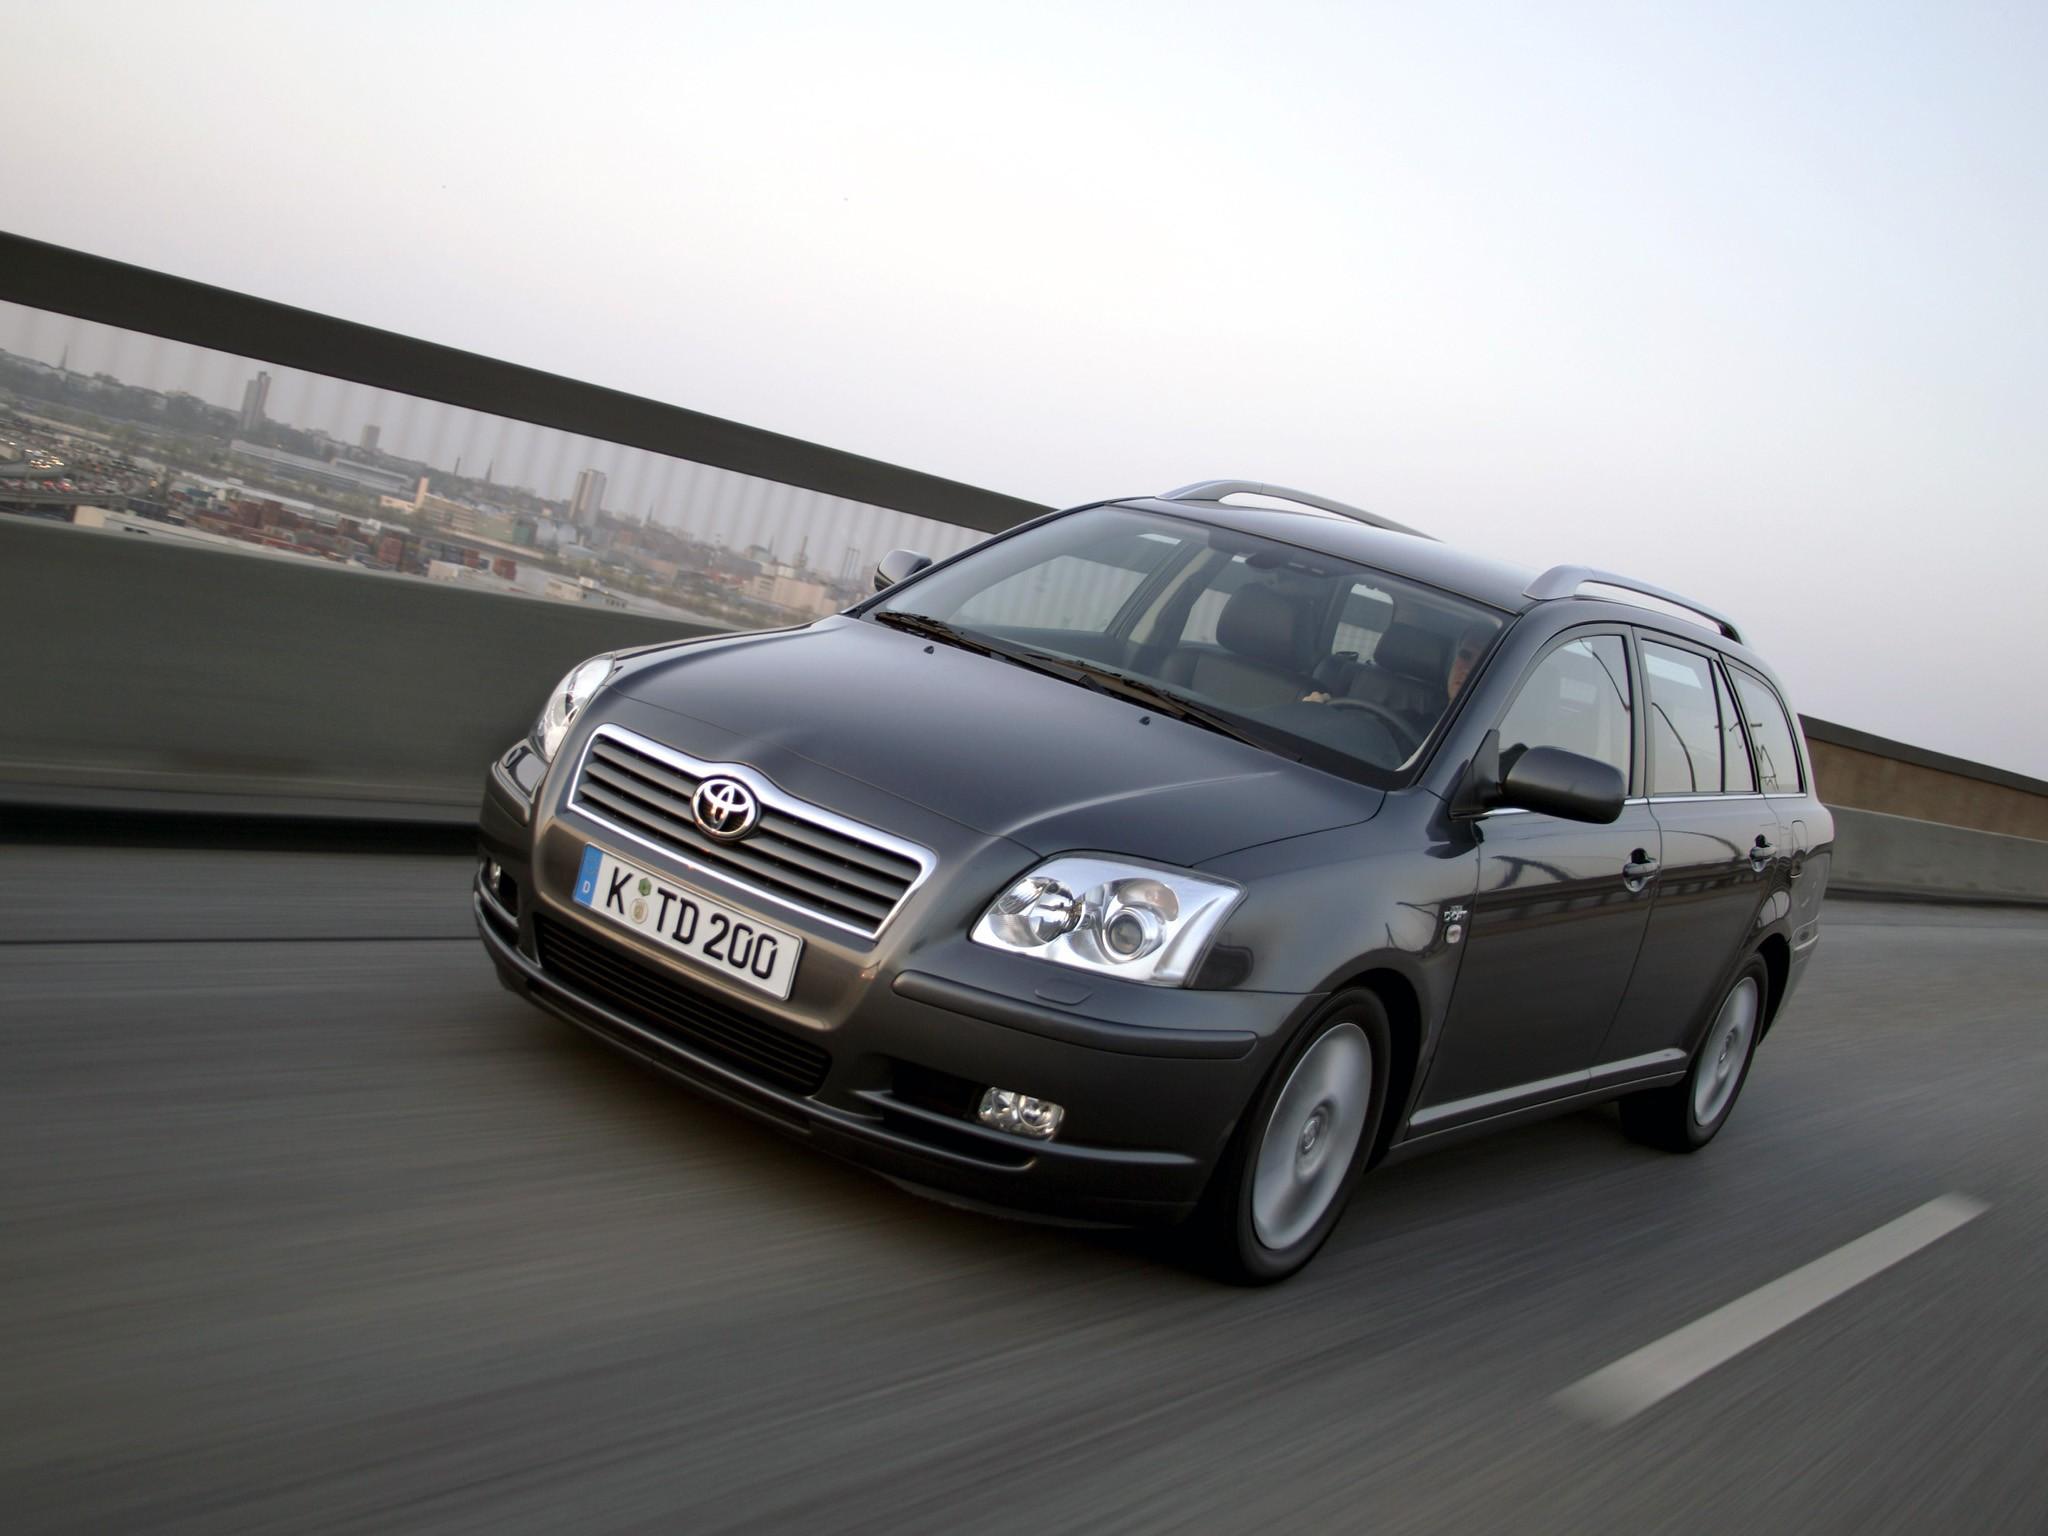 toyota avensis wagon specs - 2003, 2004, 2005, 2006 - autoevolution